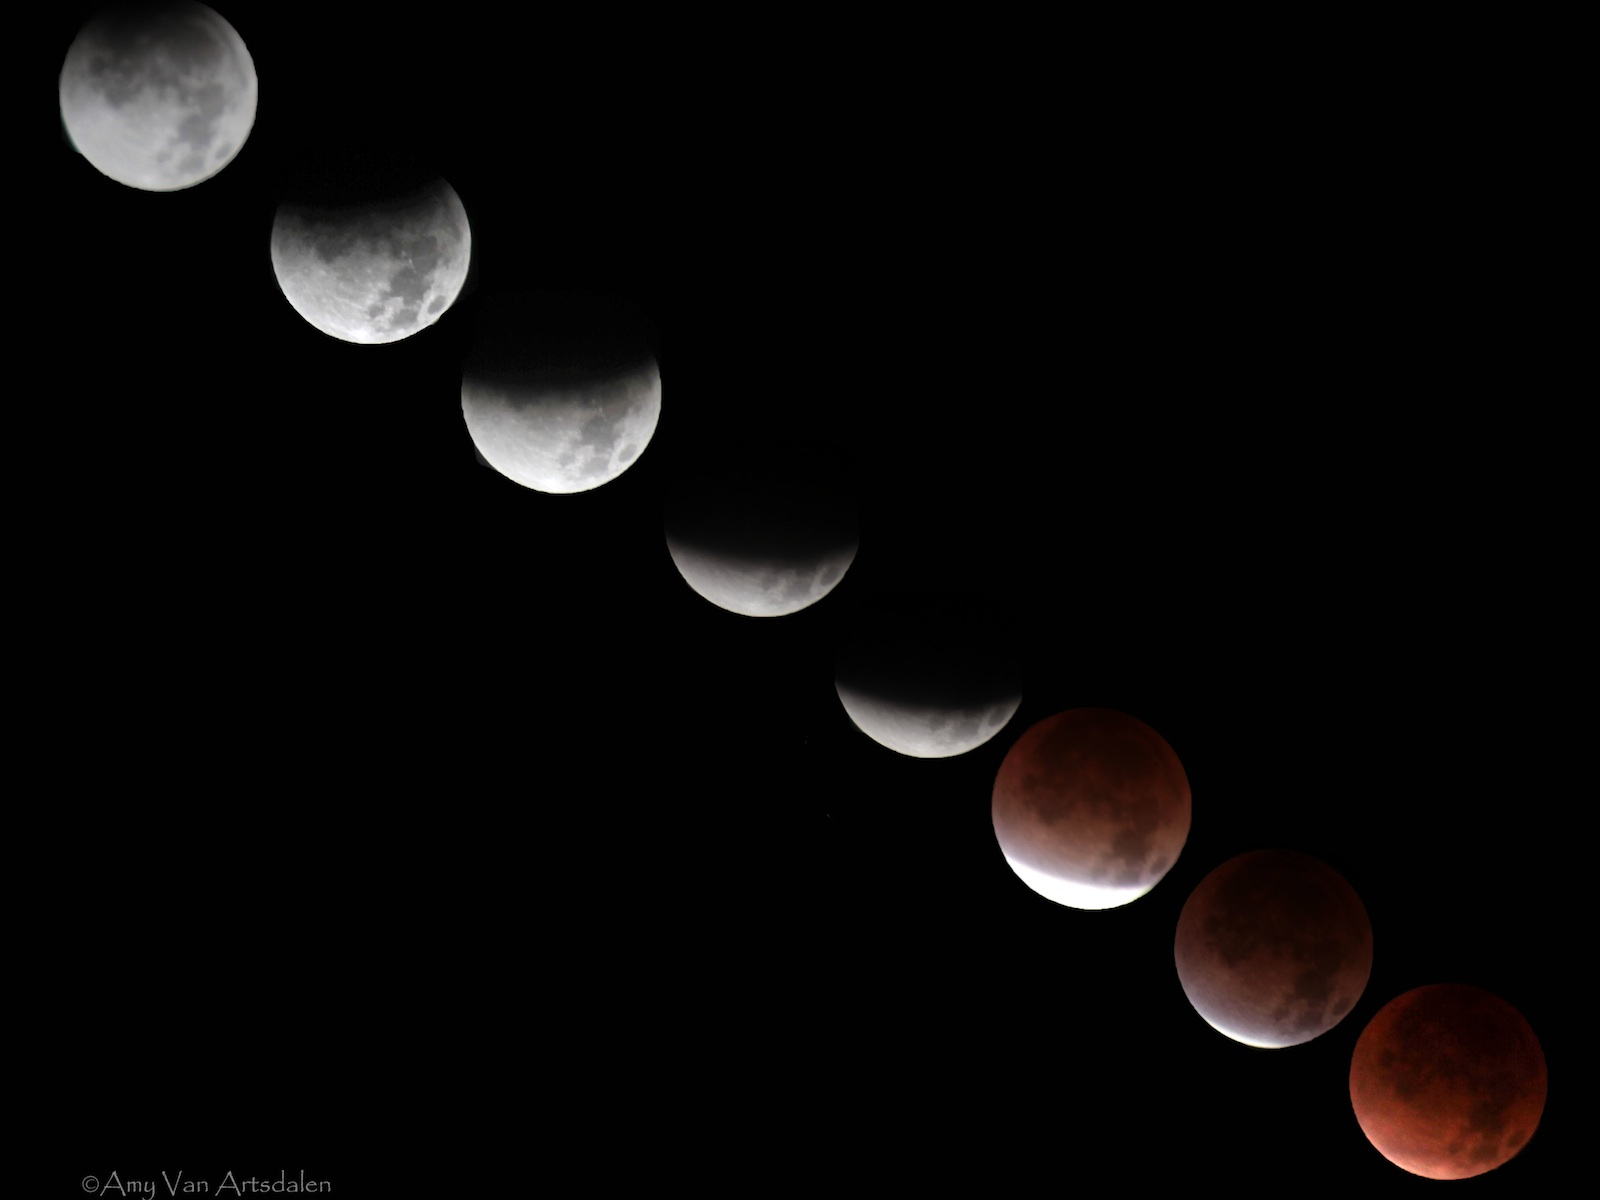 Total Lunar Eclipse - Dec. 2011